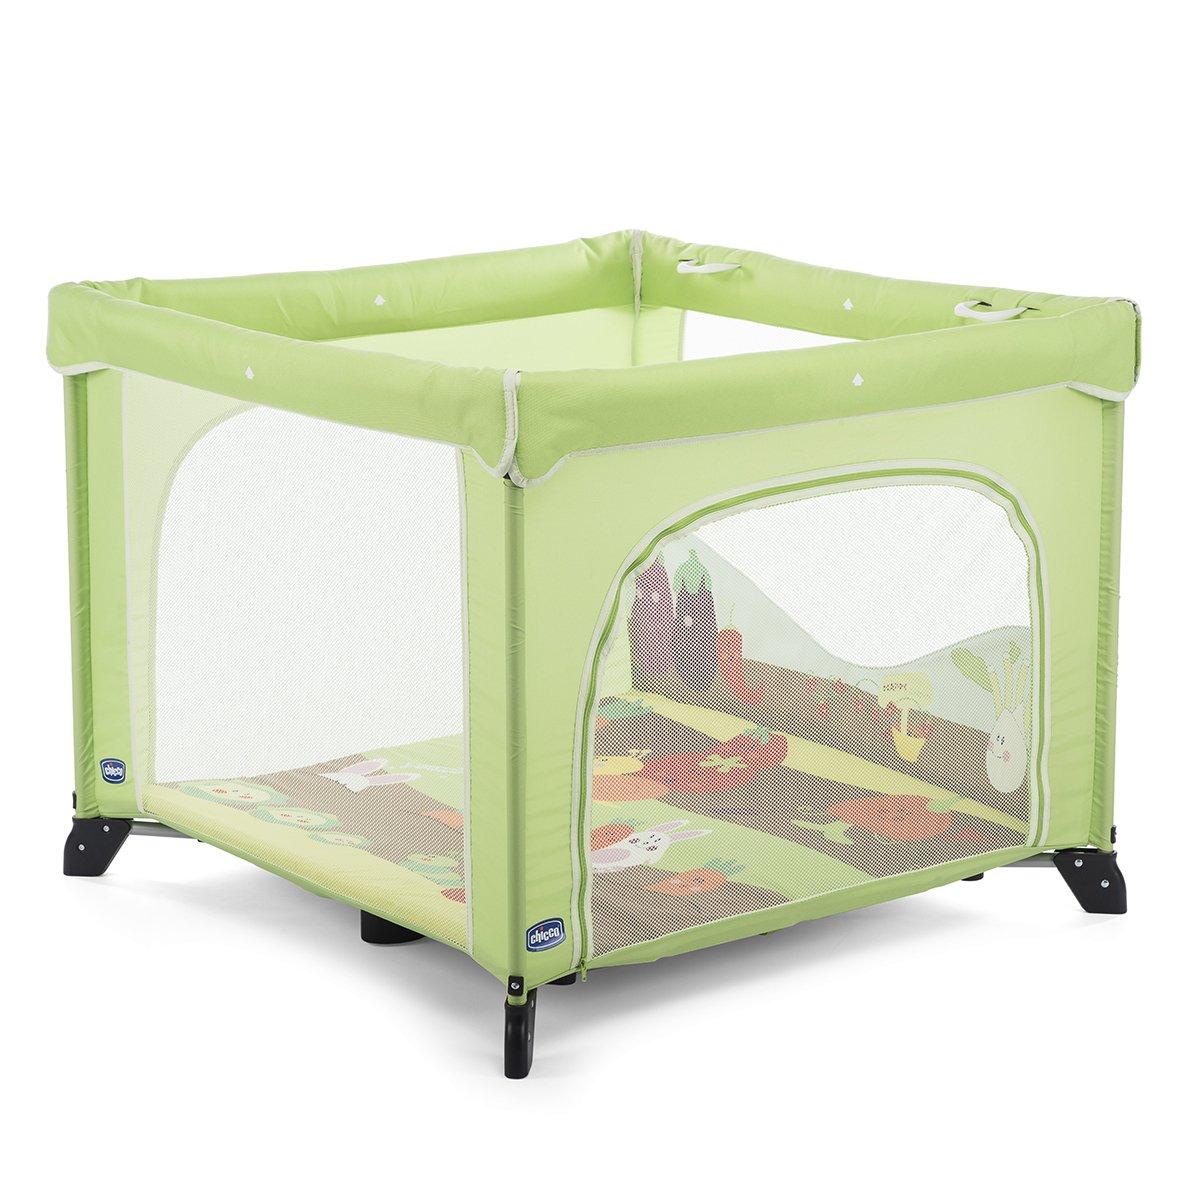 Chicco 07079841030000 Fruit Salad Box Open, 94x94x76 cm, Verde Artsana